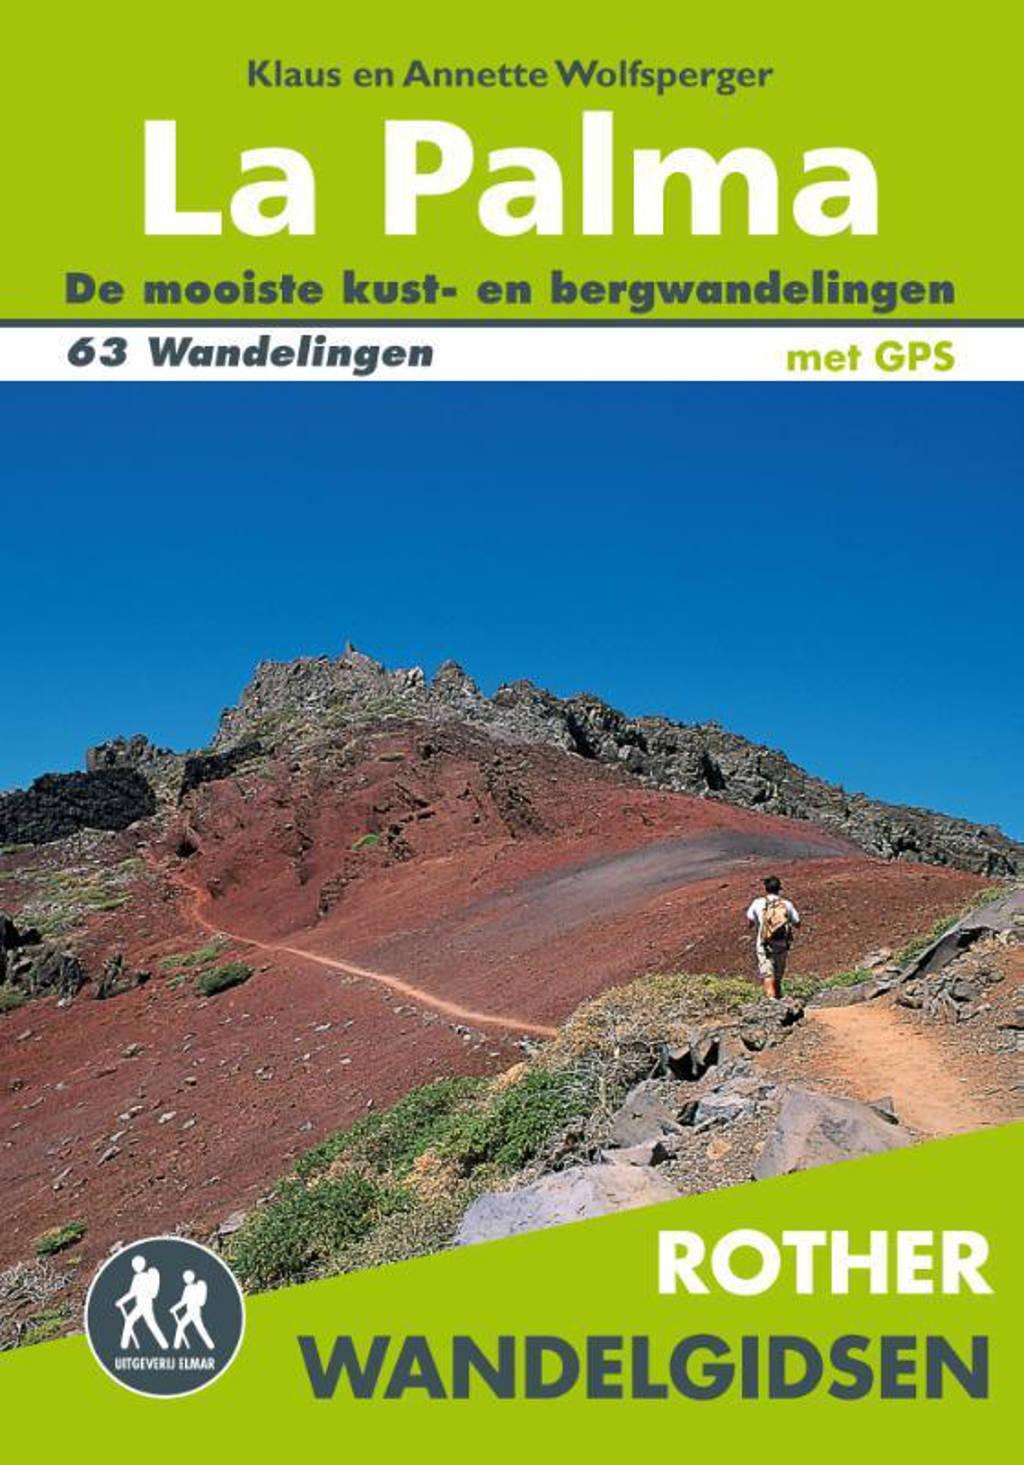 Rother Wandelgidsen: Rother La Palma - Klaus Wolfsperger en Annette Miehle-Wolfsperger